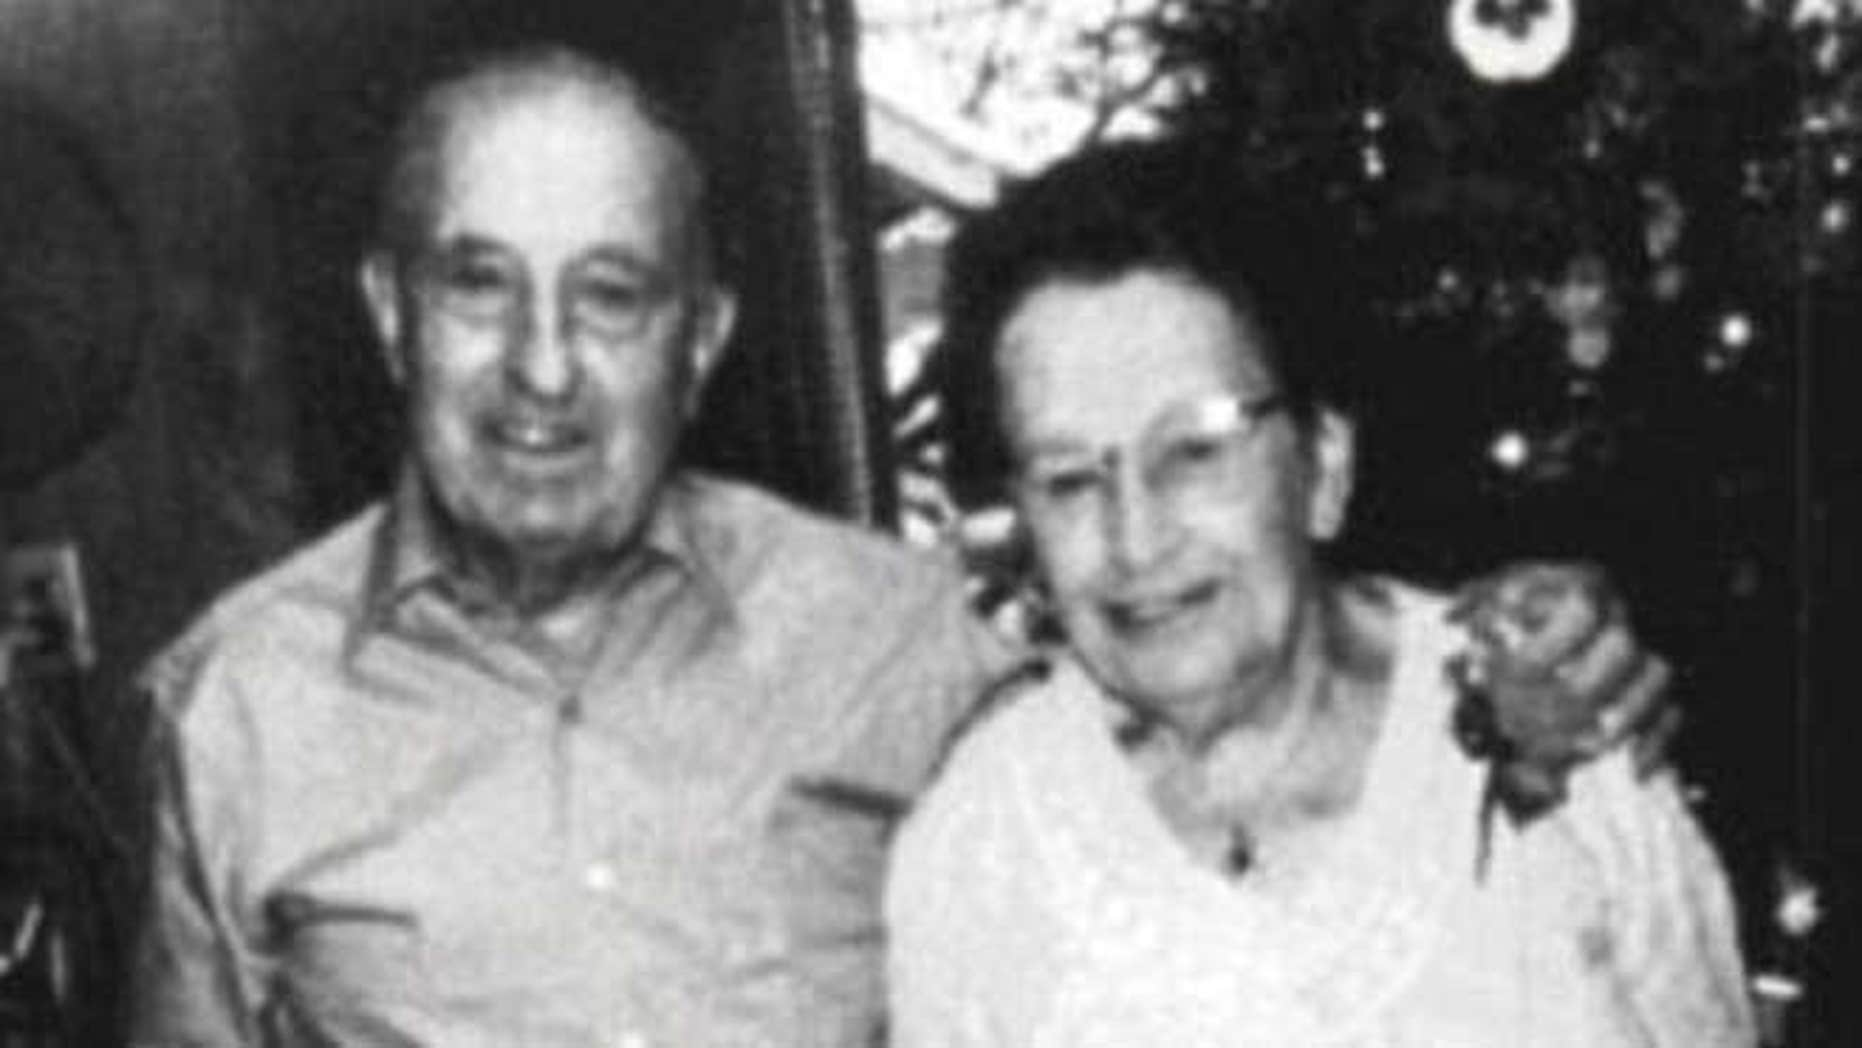 Edward Maurin and his wife Wilhelmina Maurin.